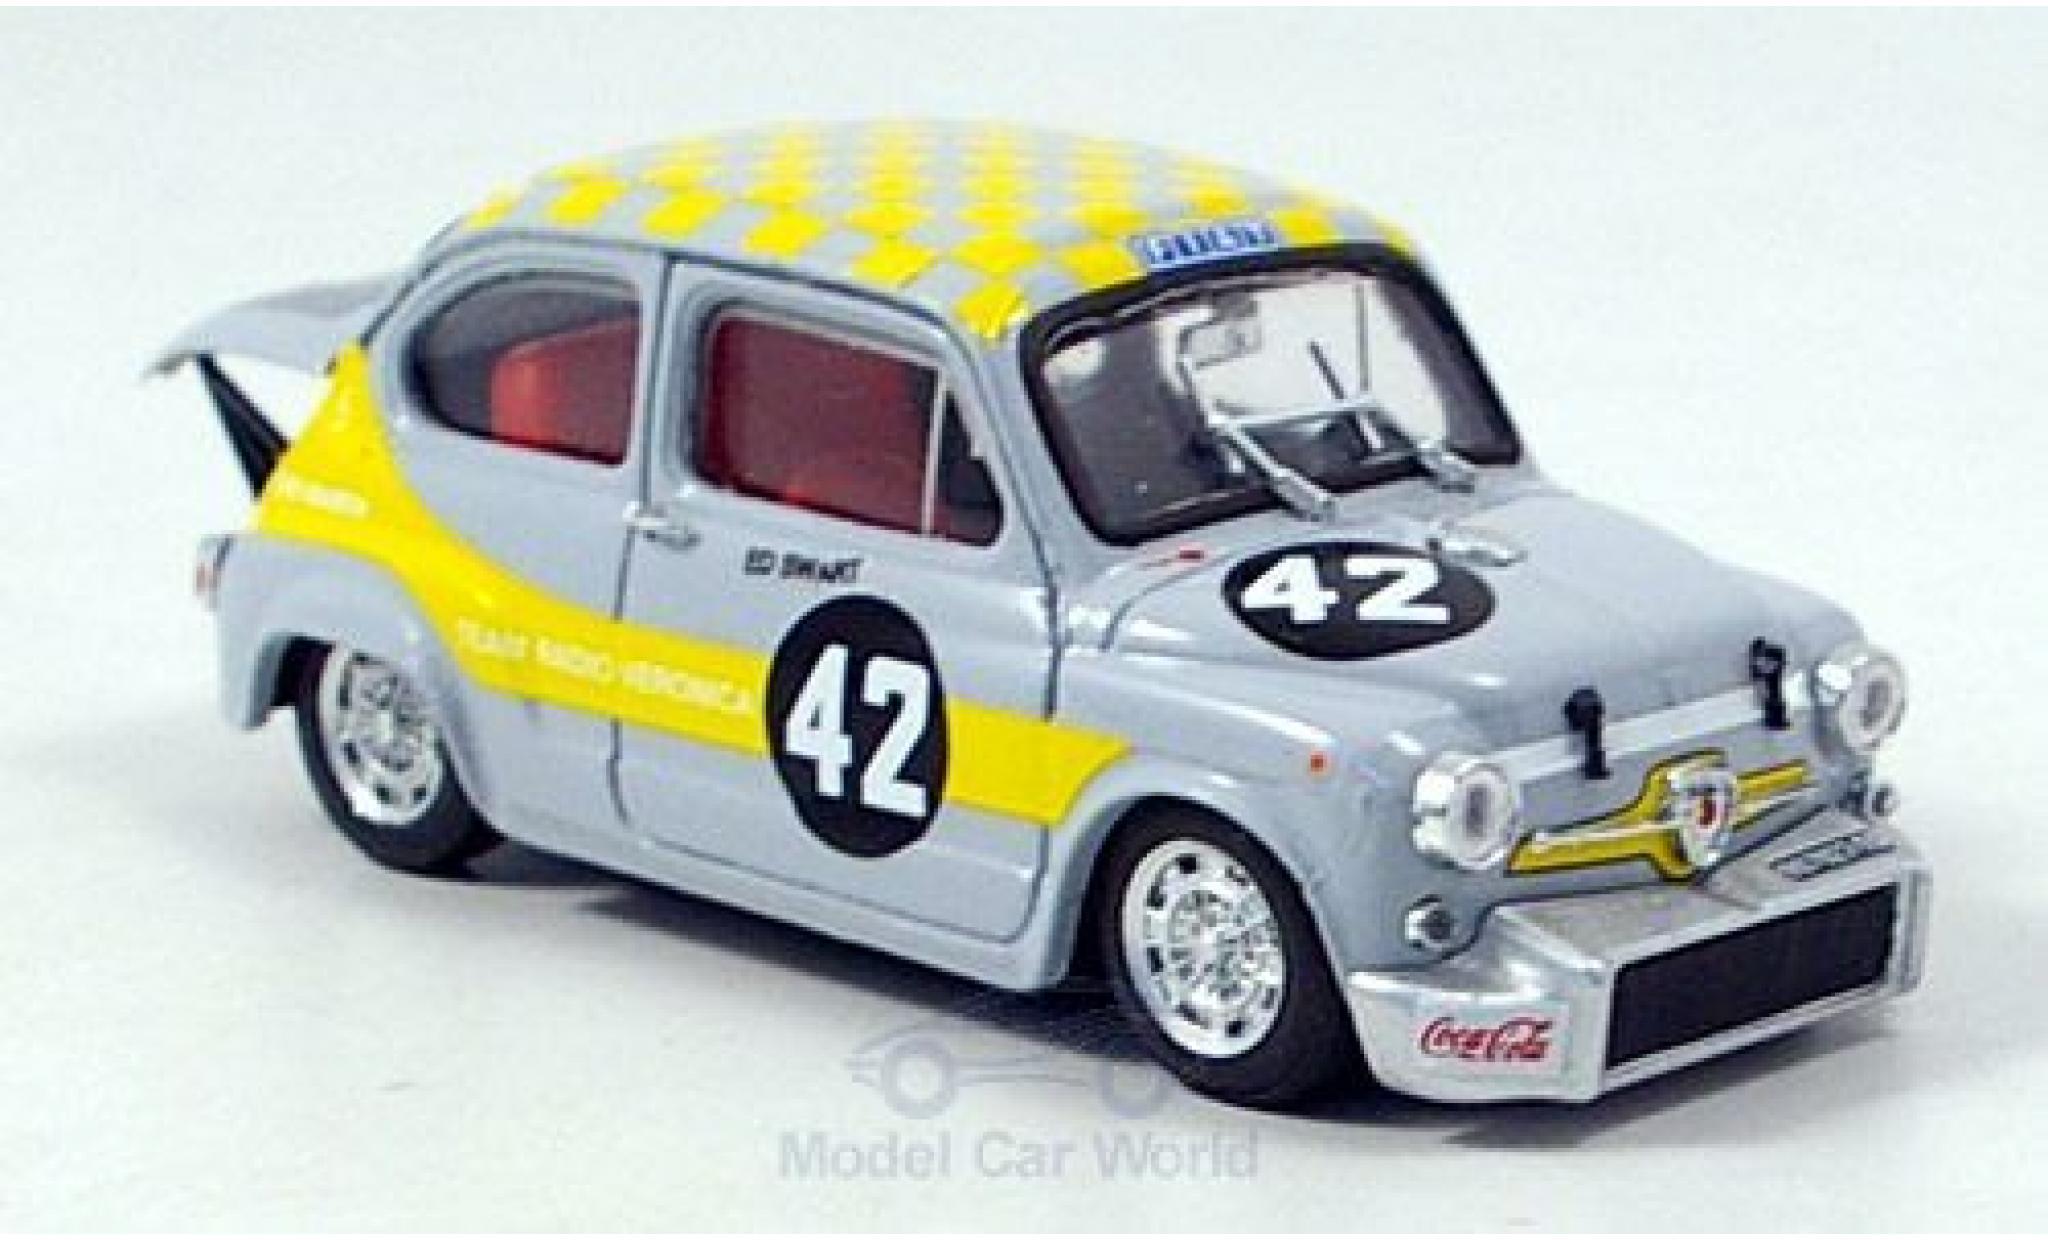 Fiat Abarth 1000 1/43 Brumm Berlina No.42 Team Radio Veronica Zandvoort Trophy 1969 E.Swart